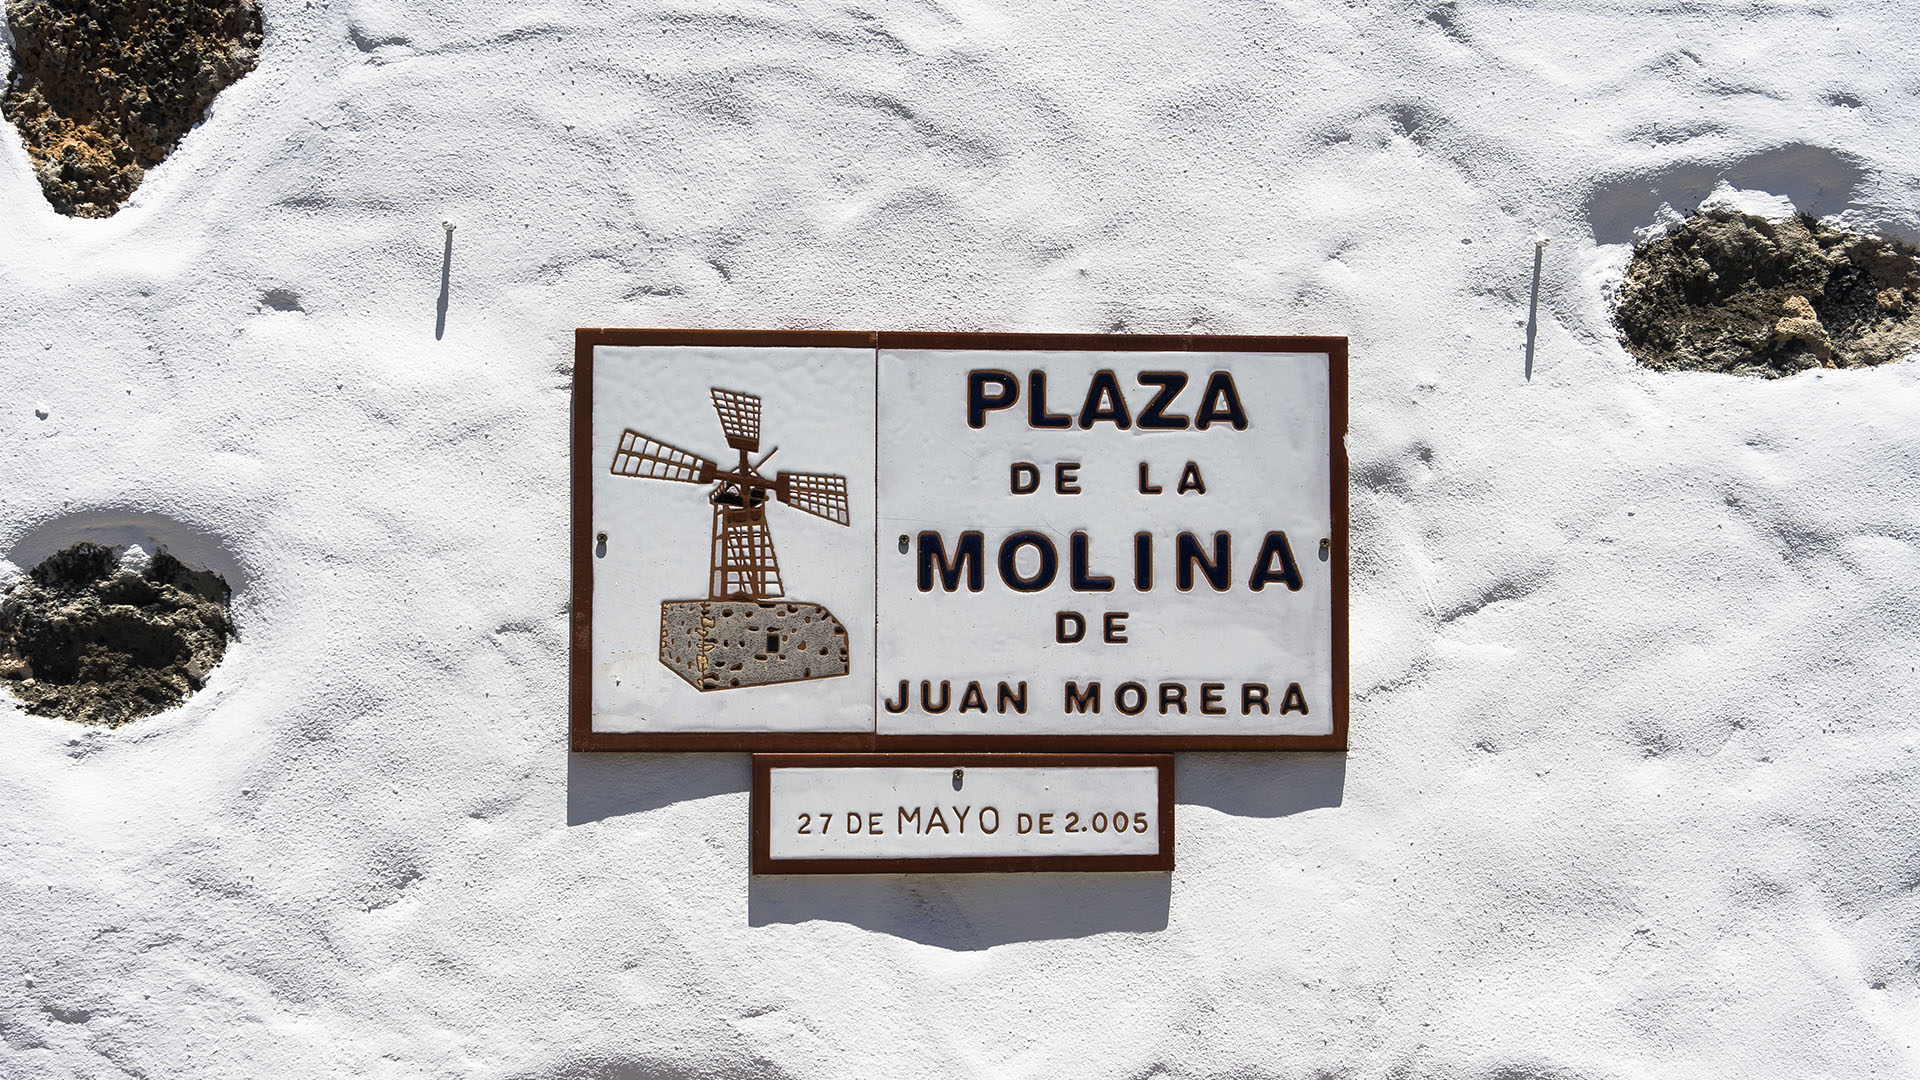 Die Windmühlen von Corralejo Fuerteventura: Molina de Juan Morera